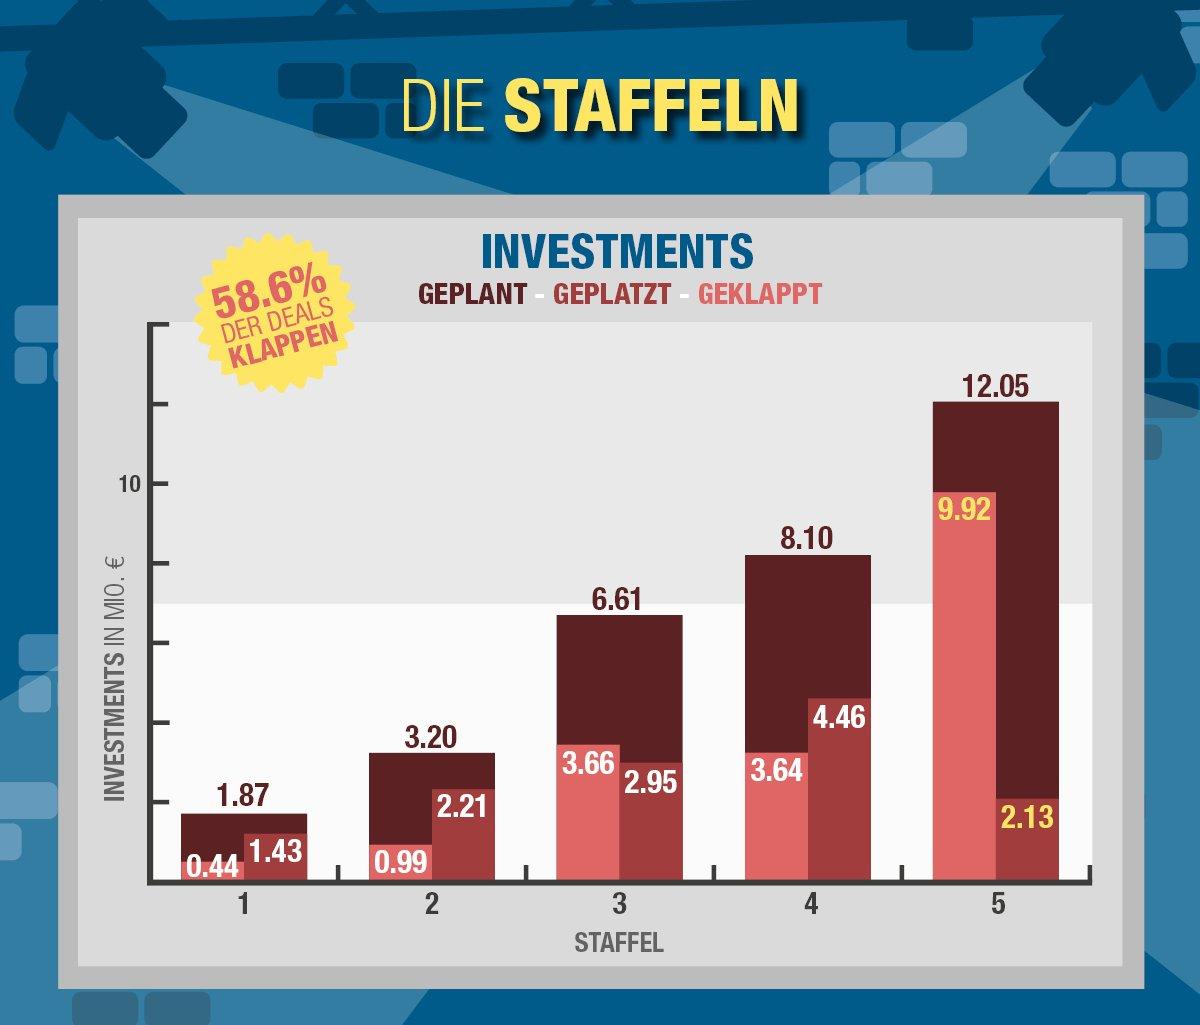 Hoehle_der_Loewen_statistik_investments